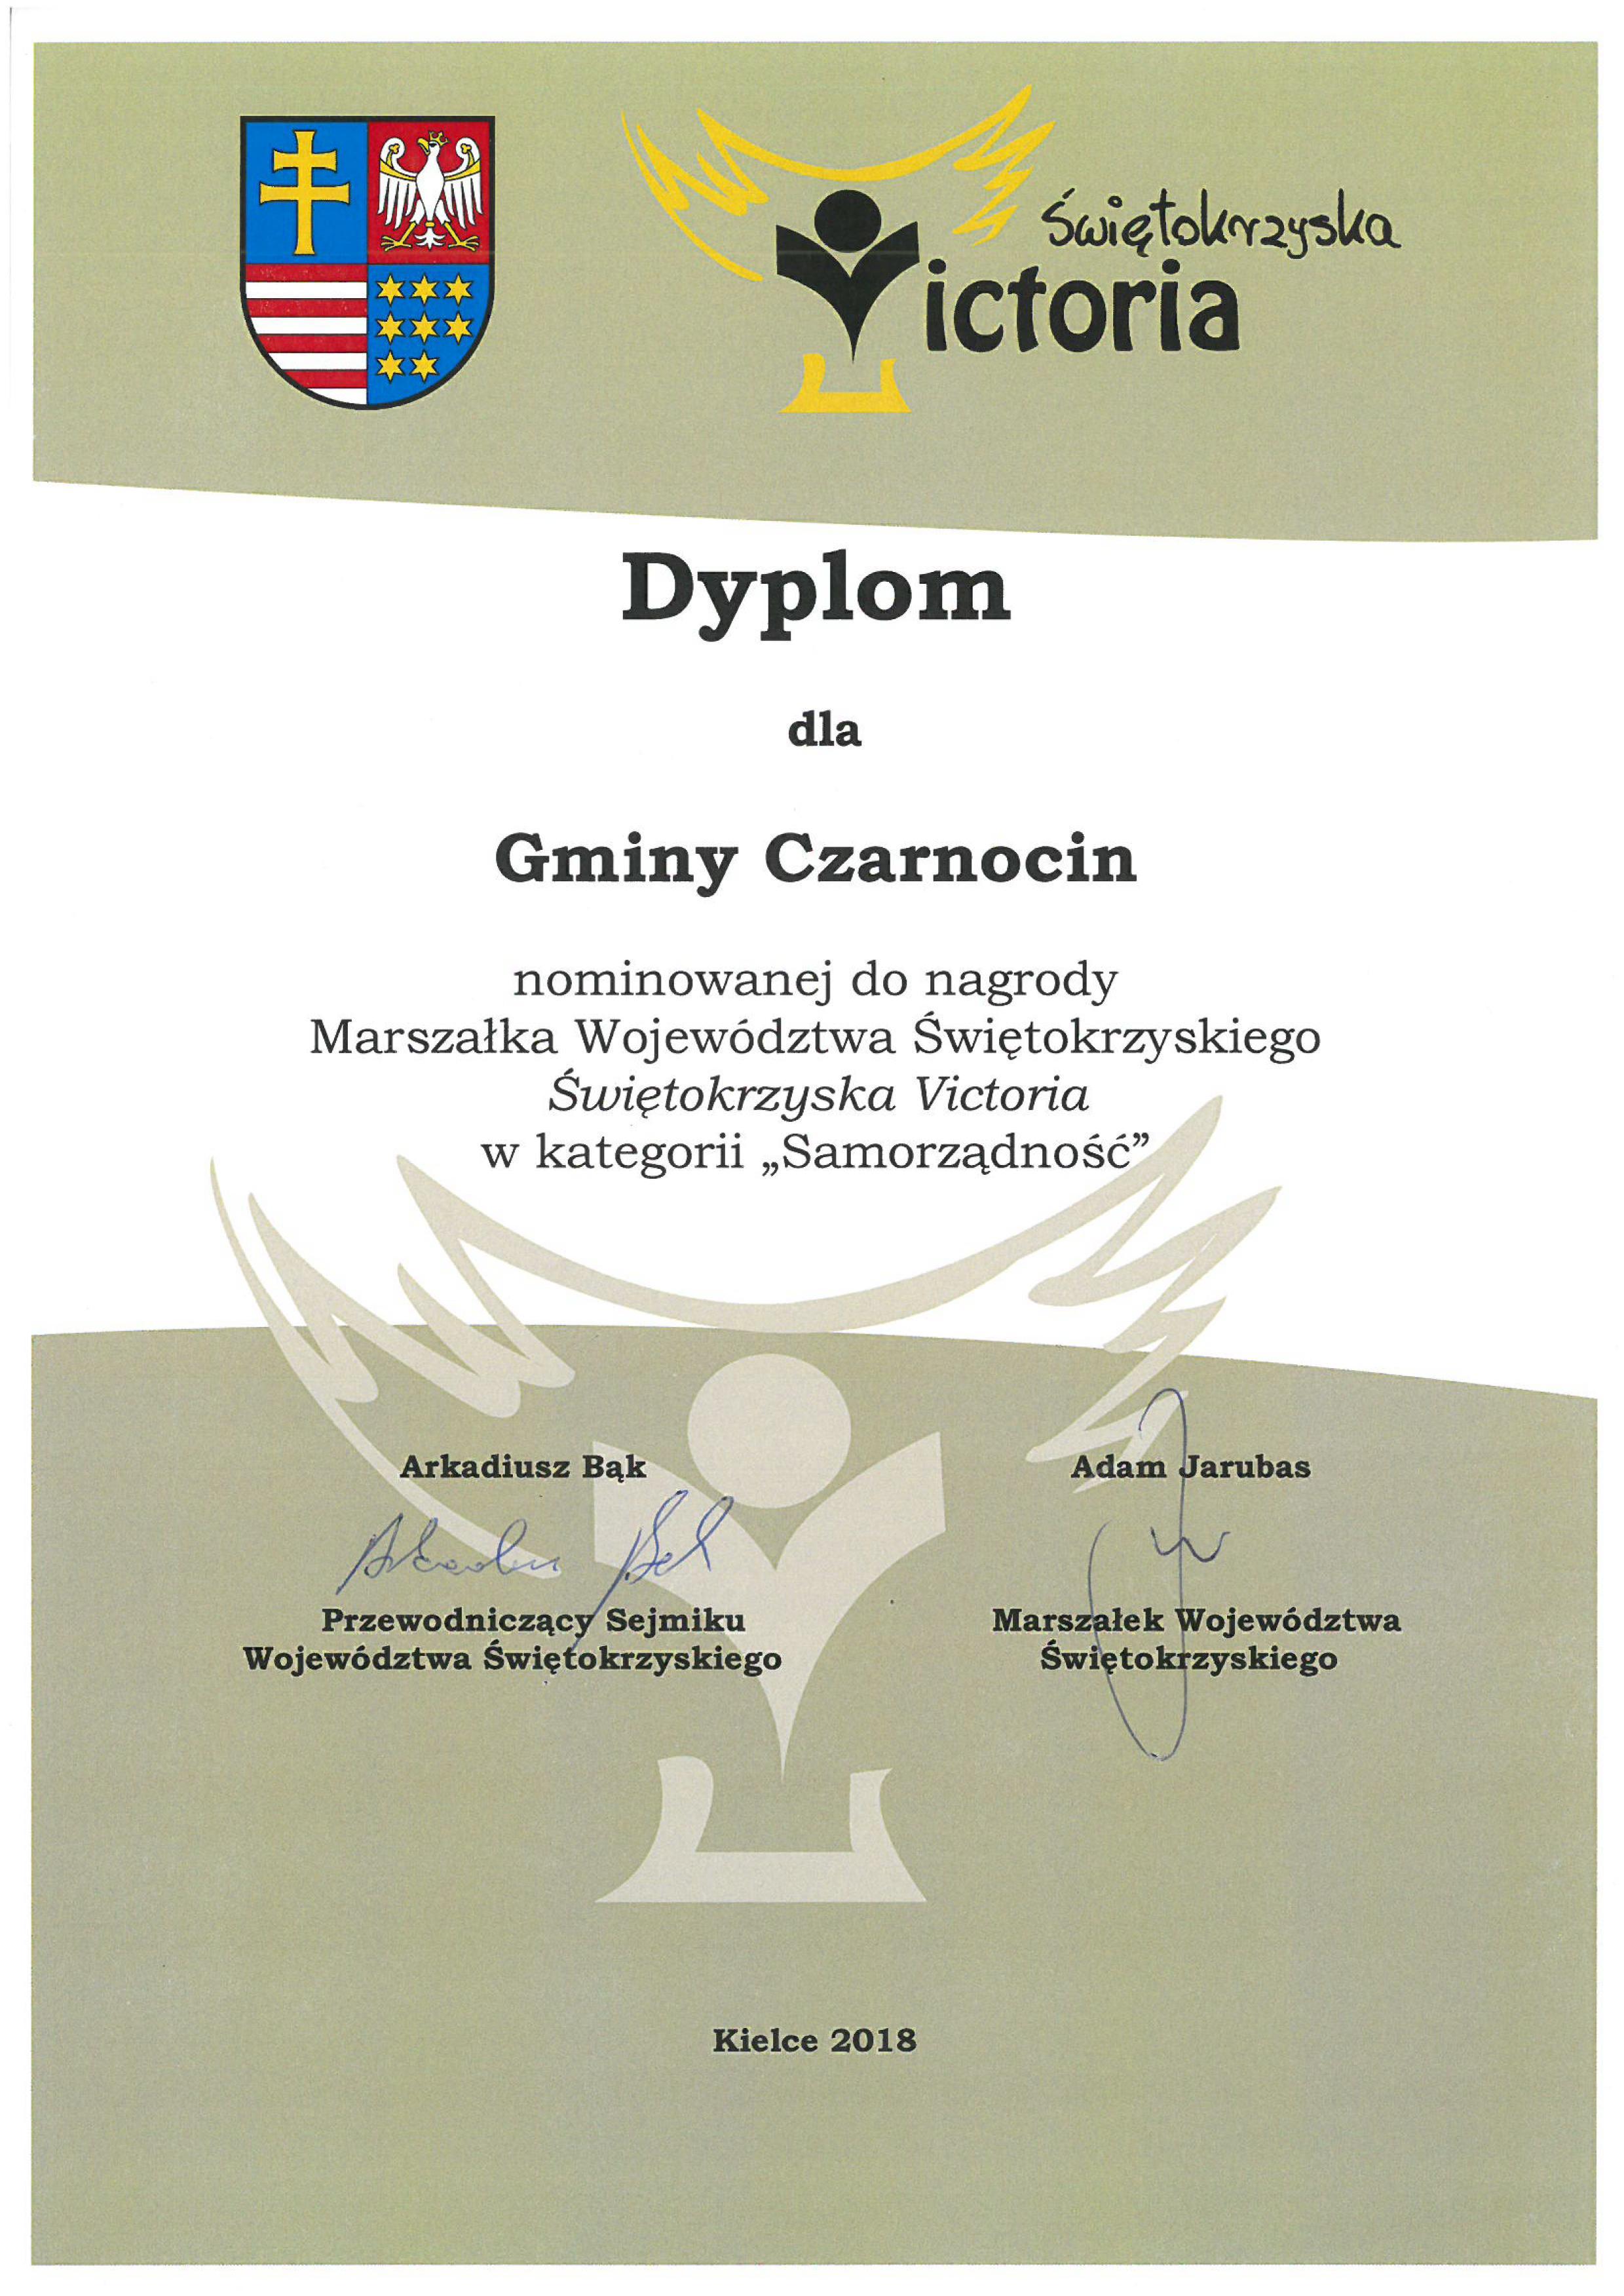 dyplomvictoria12018.jpg